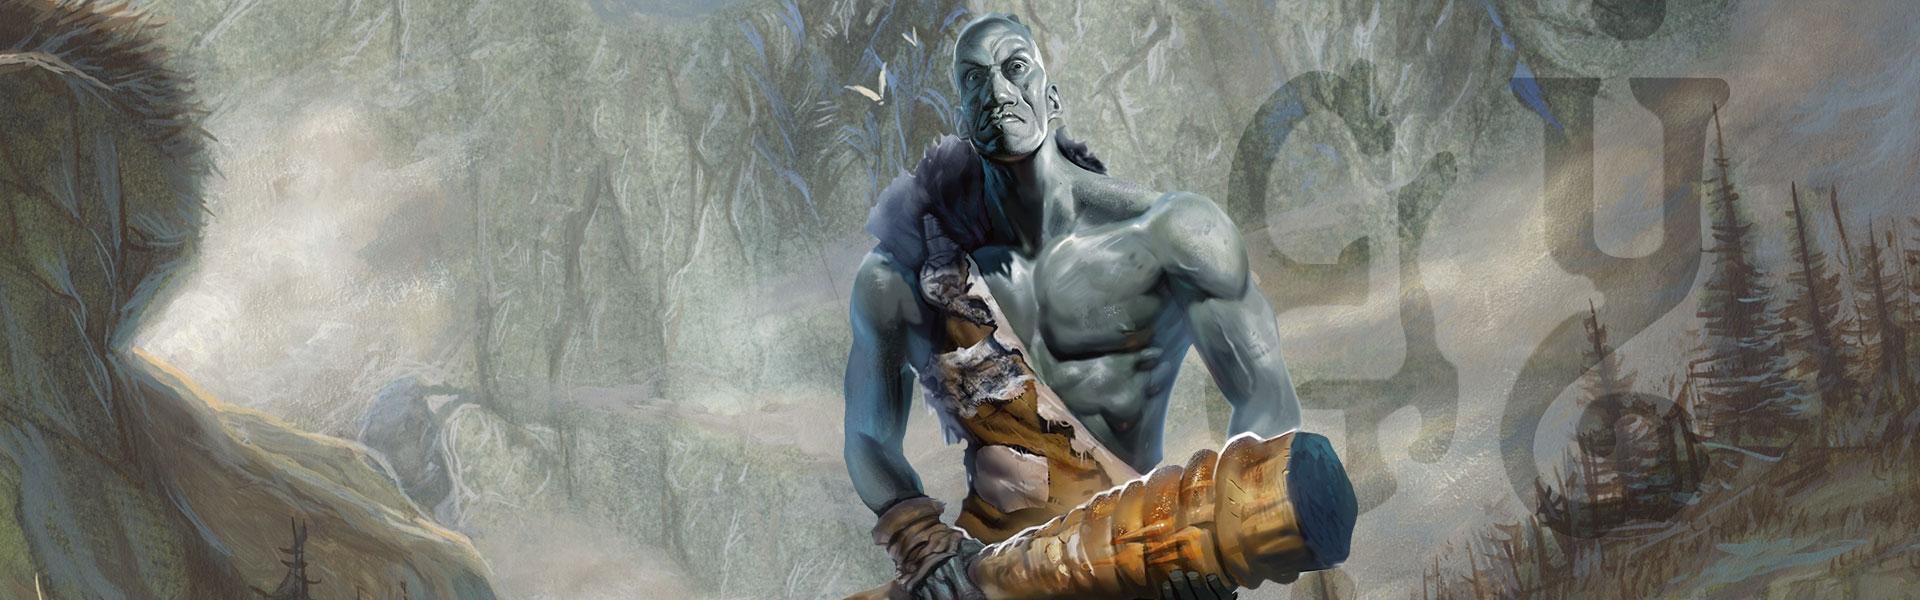 Monsters -- Stone Giants